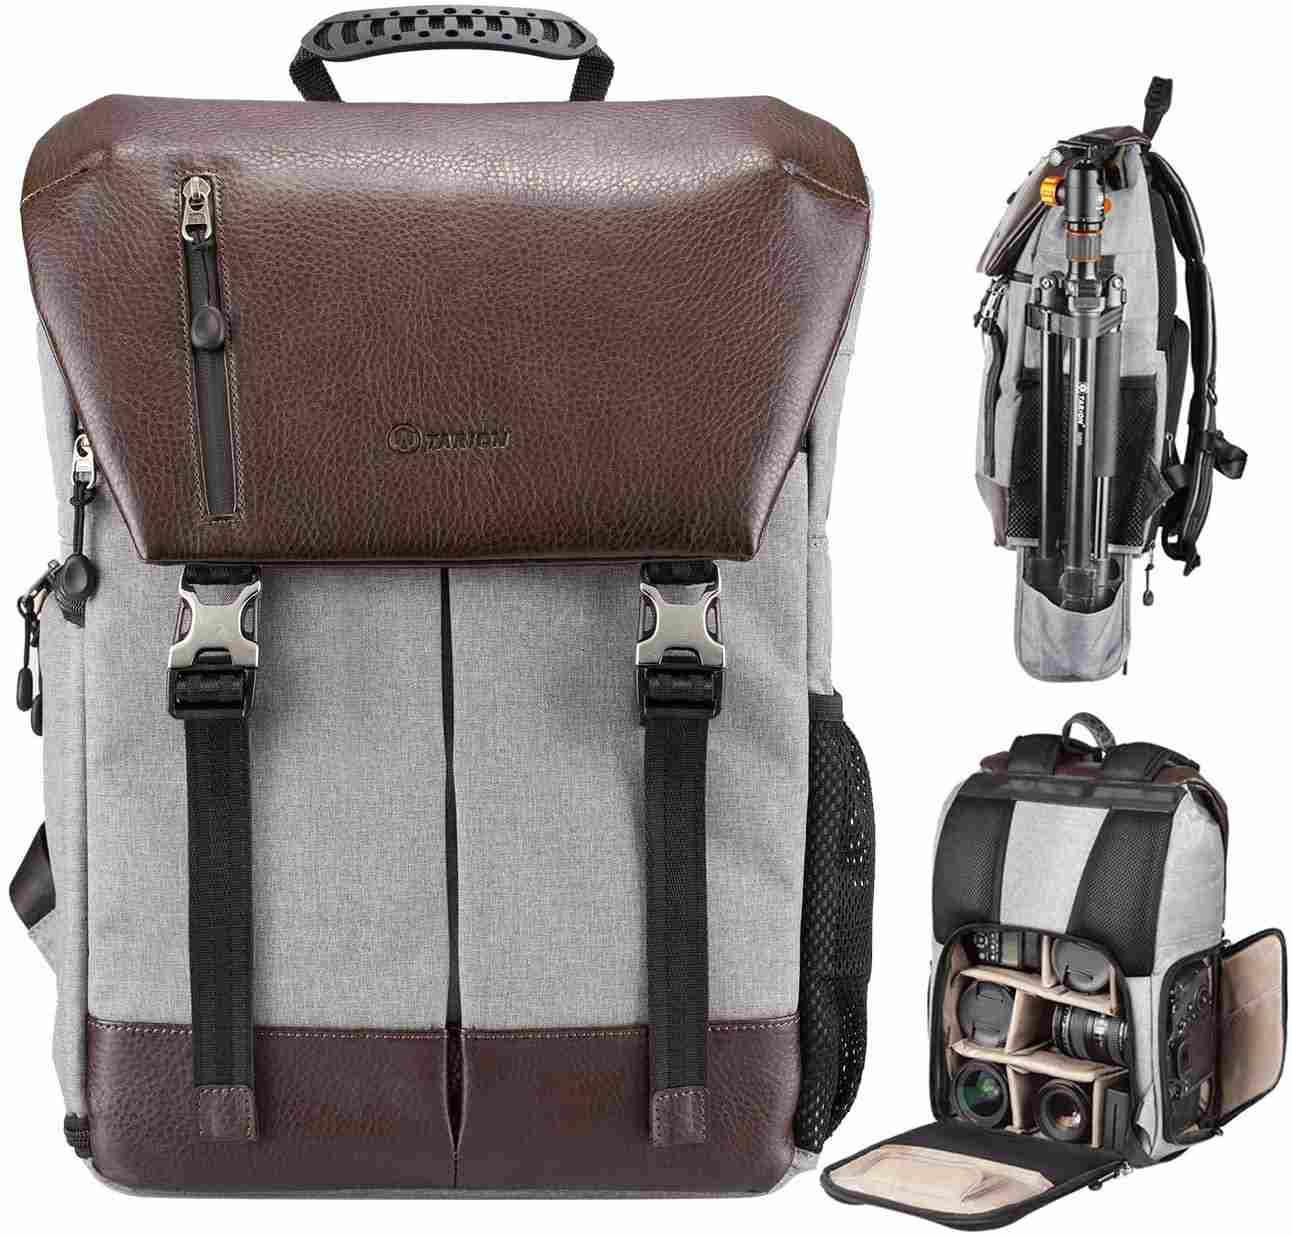 Tarion - best camera bags for women